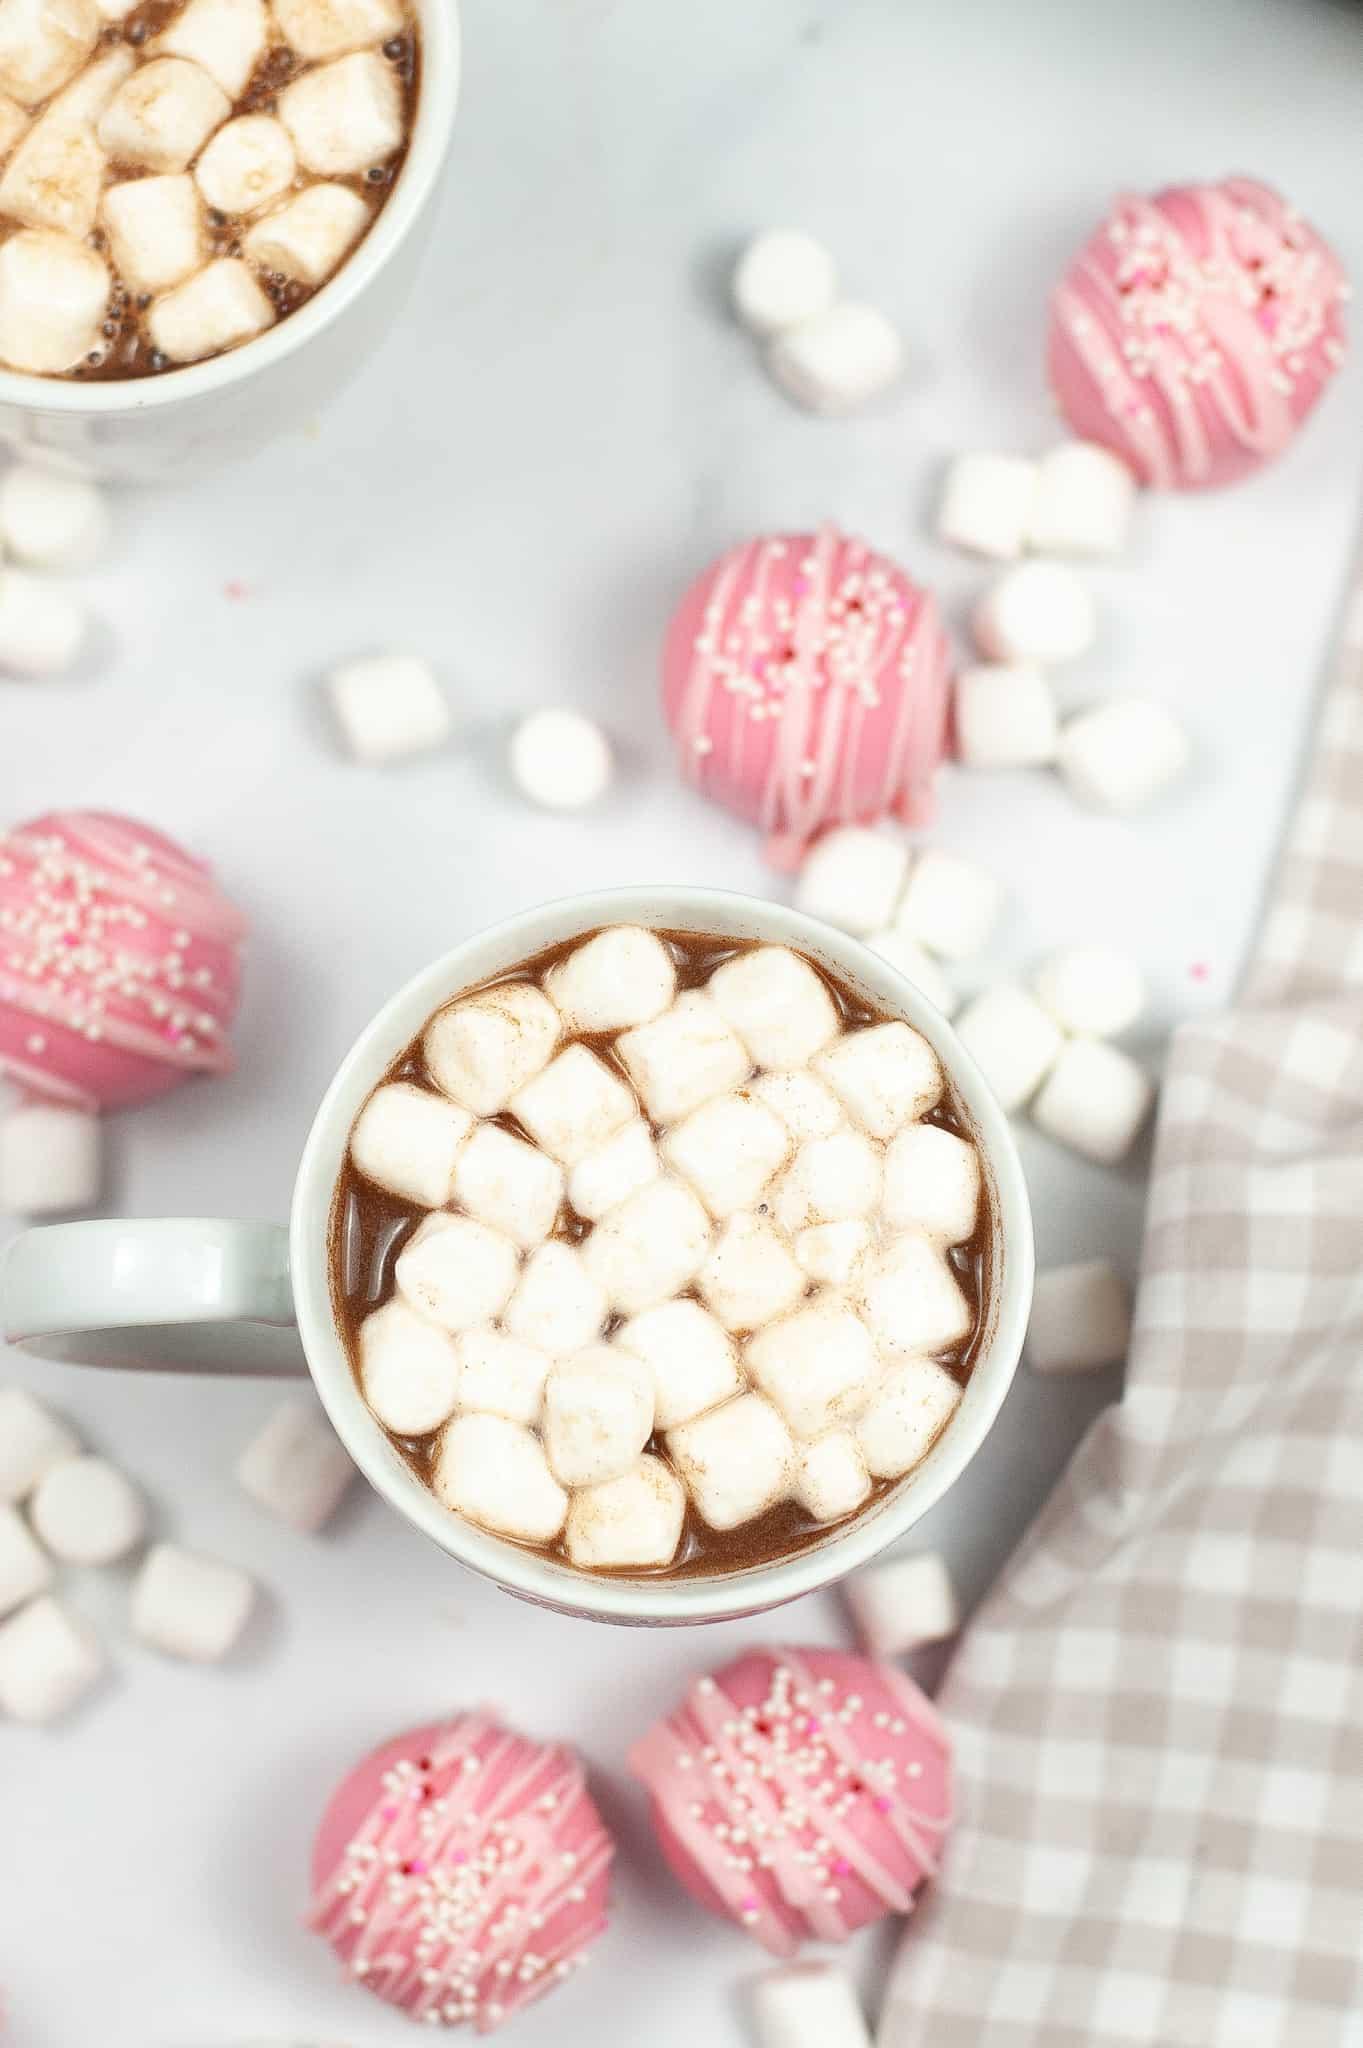 mug of hot chocolate made with cupid hot choclate bomb